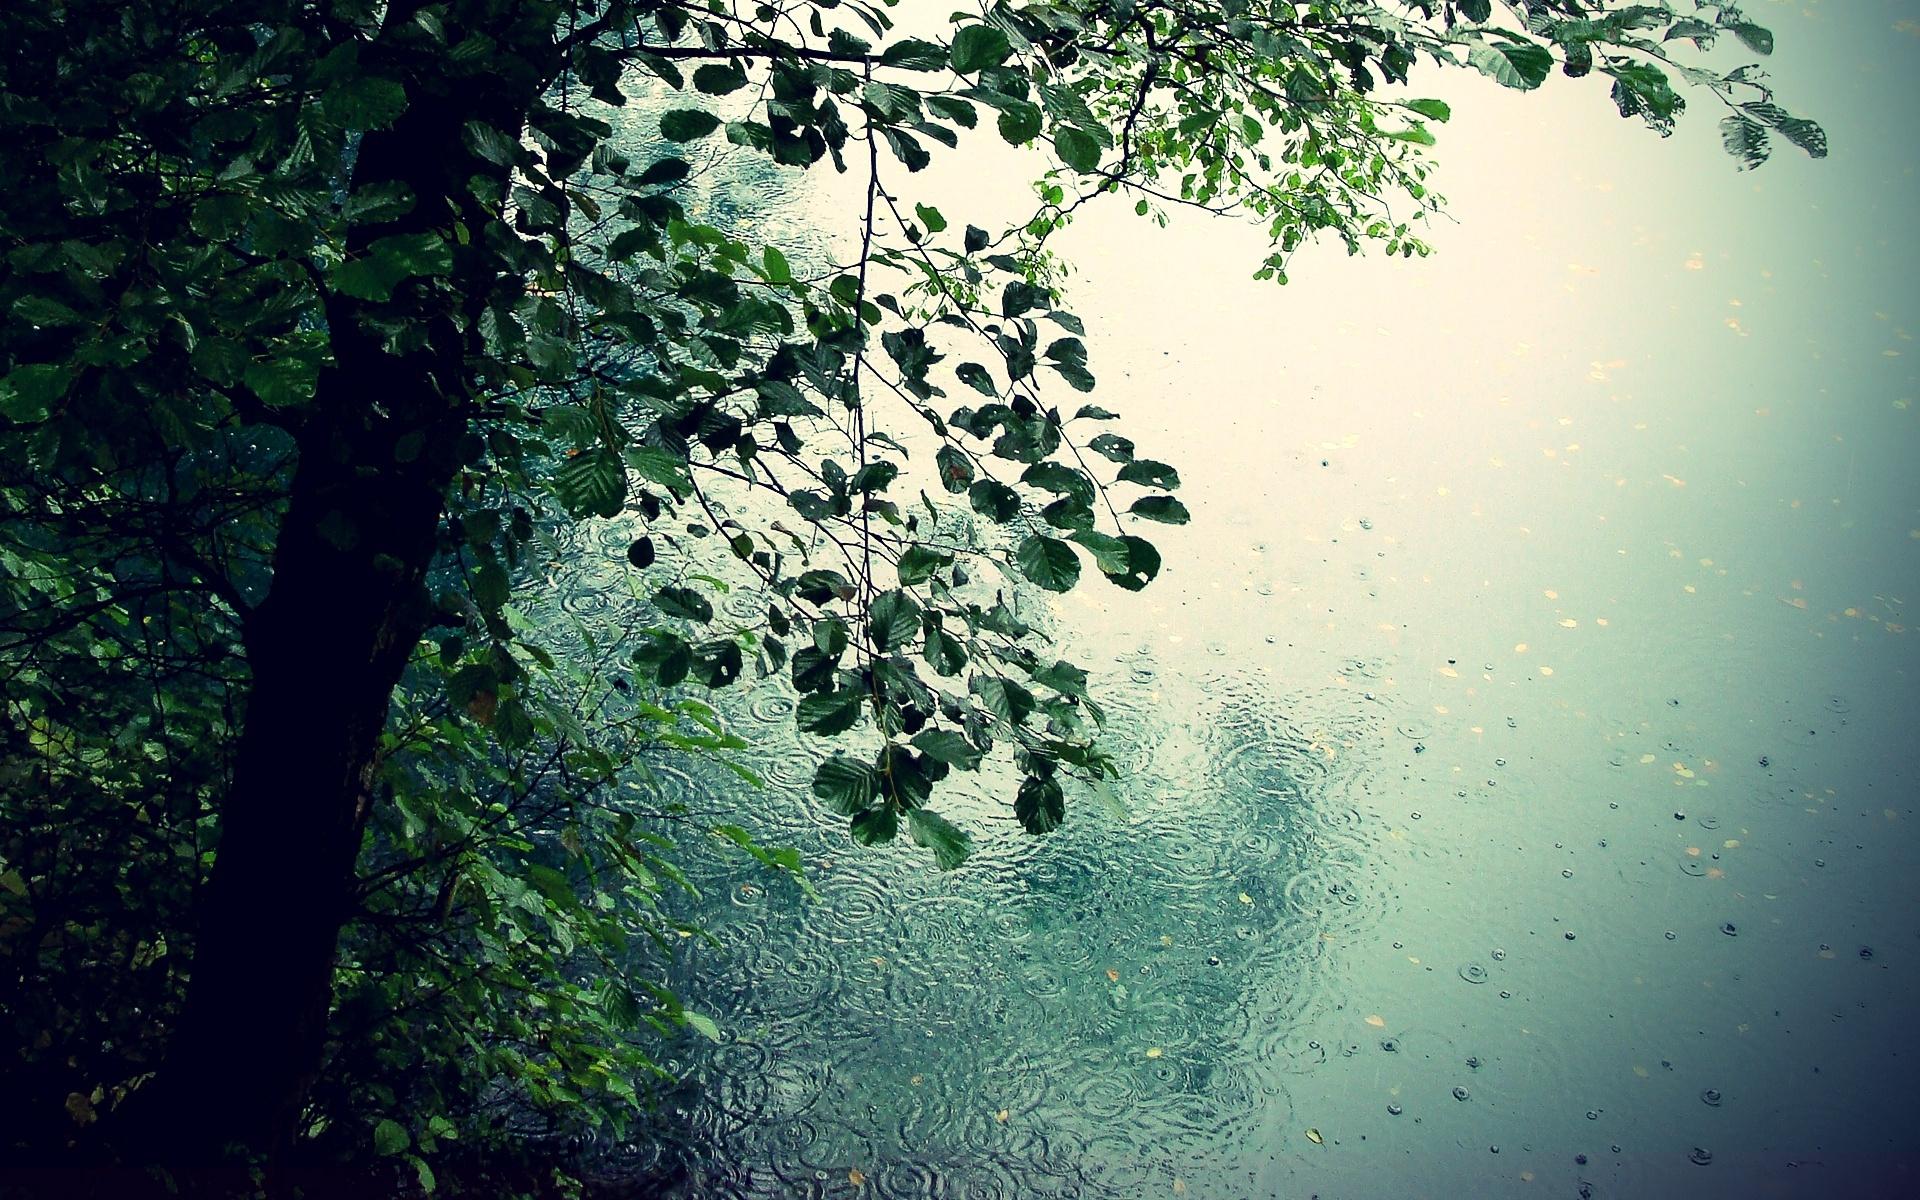 Rain Wallpapers High Quality